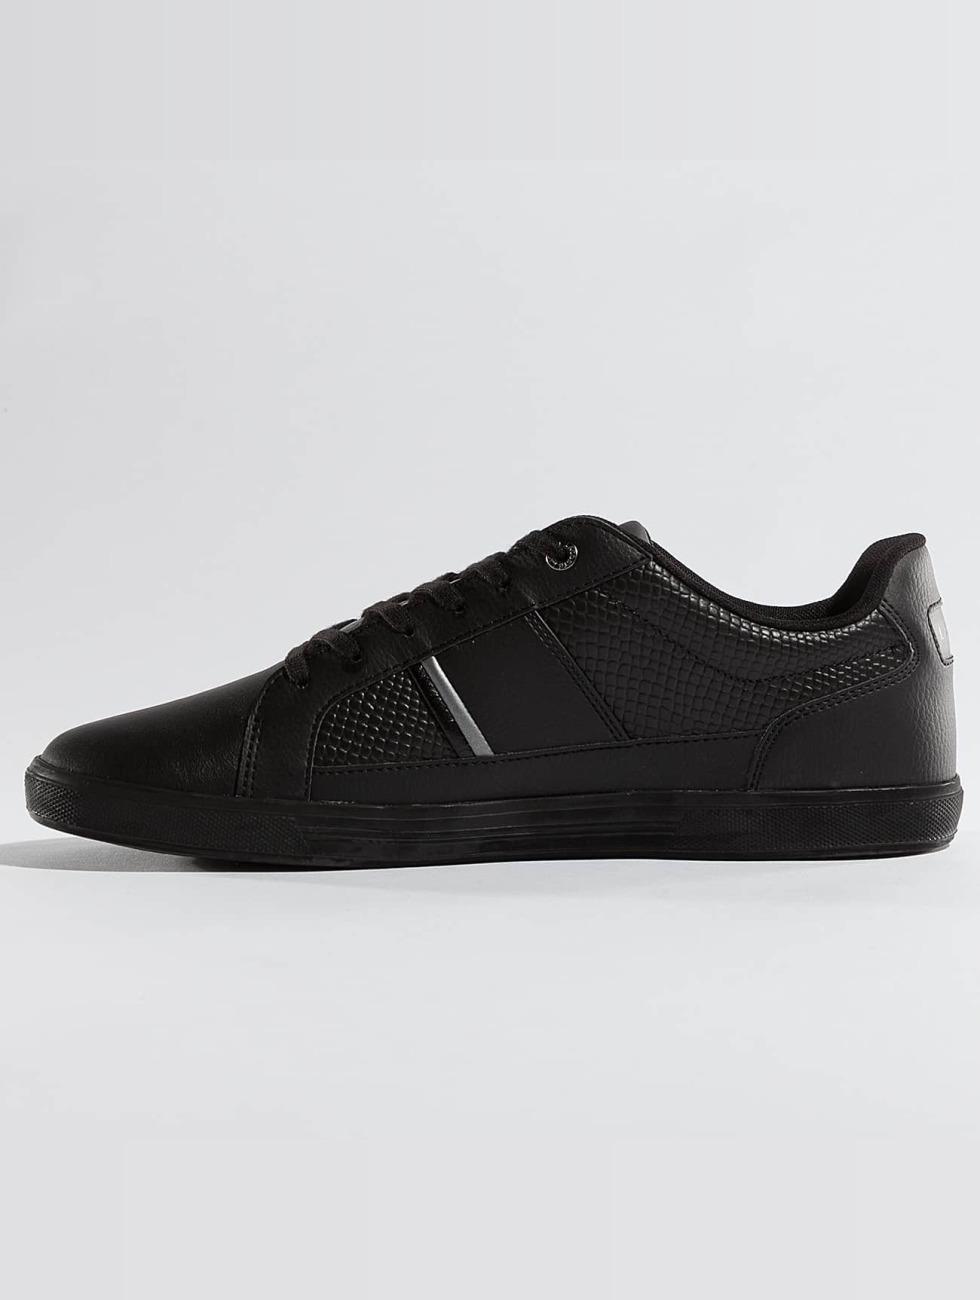 Lacoste schoen / sneaker Europa 417 SPM in zwart 336323 Winkel Goedkoop Online Geniue Leverancier Online Modieuze Online UkwrSKfEA